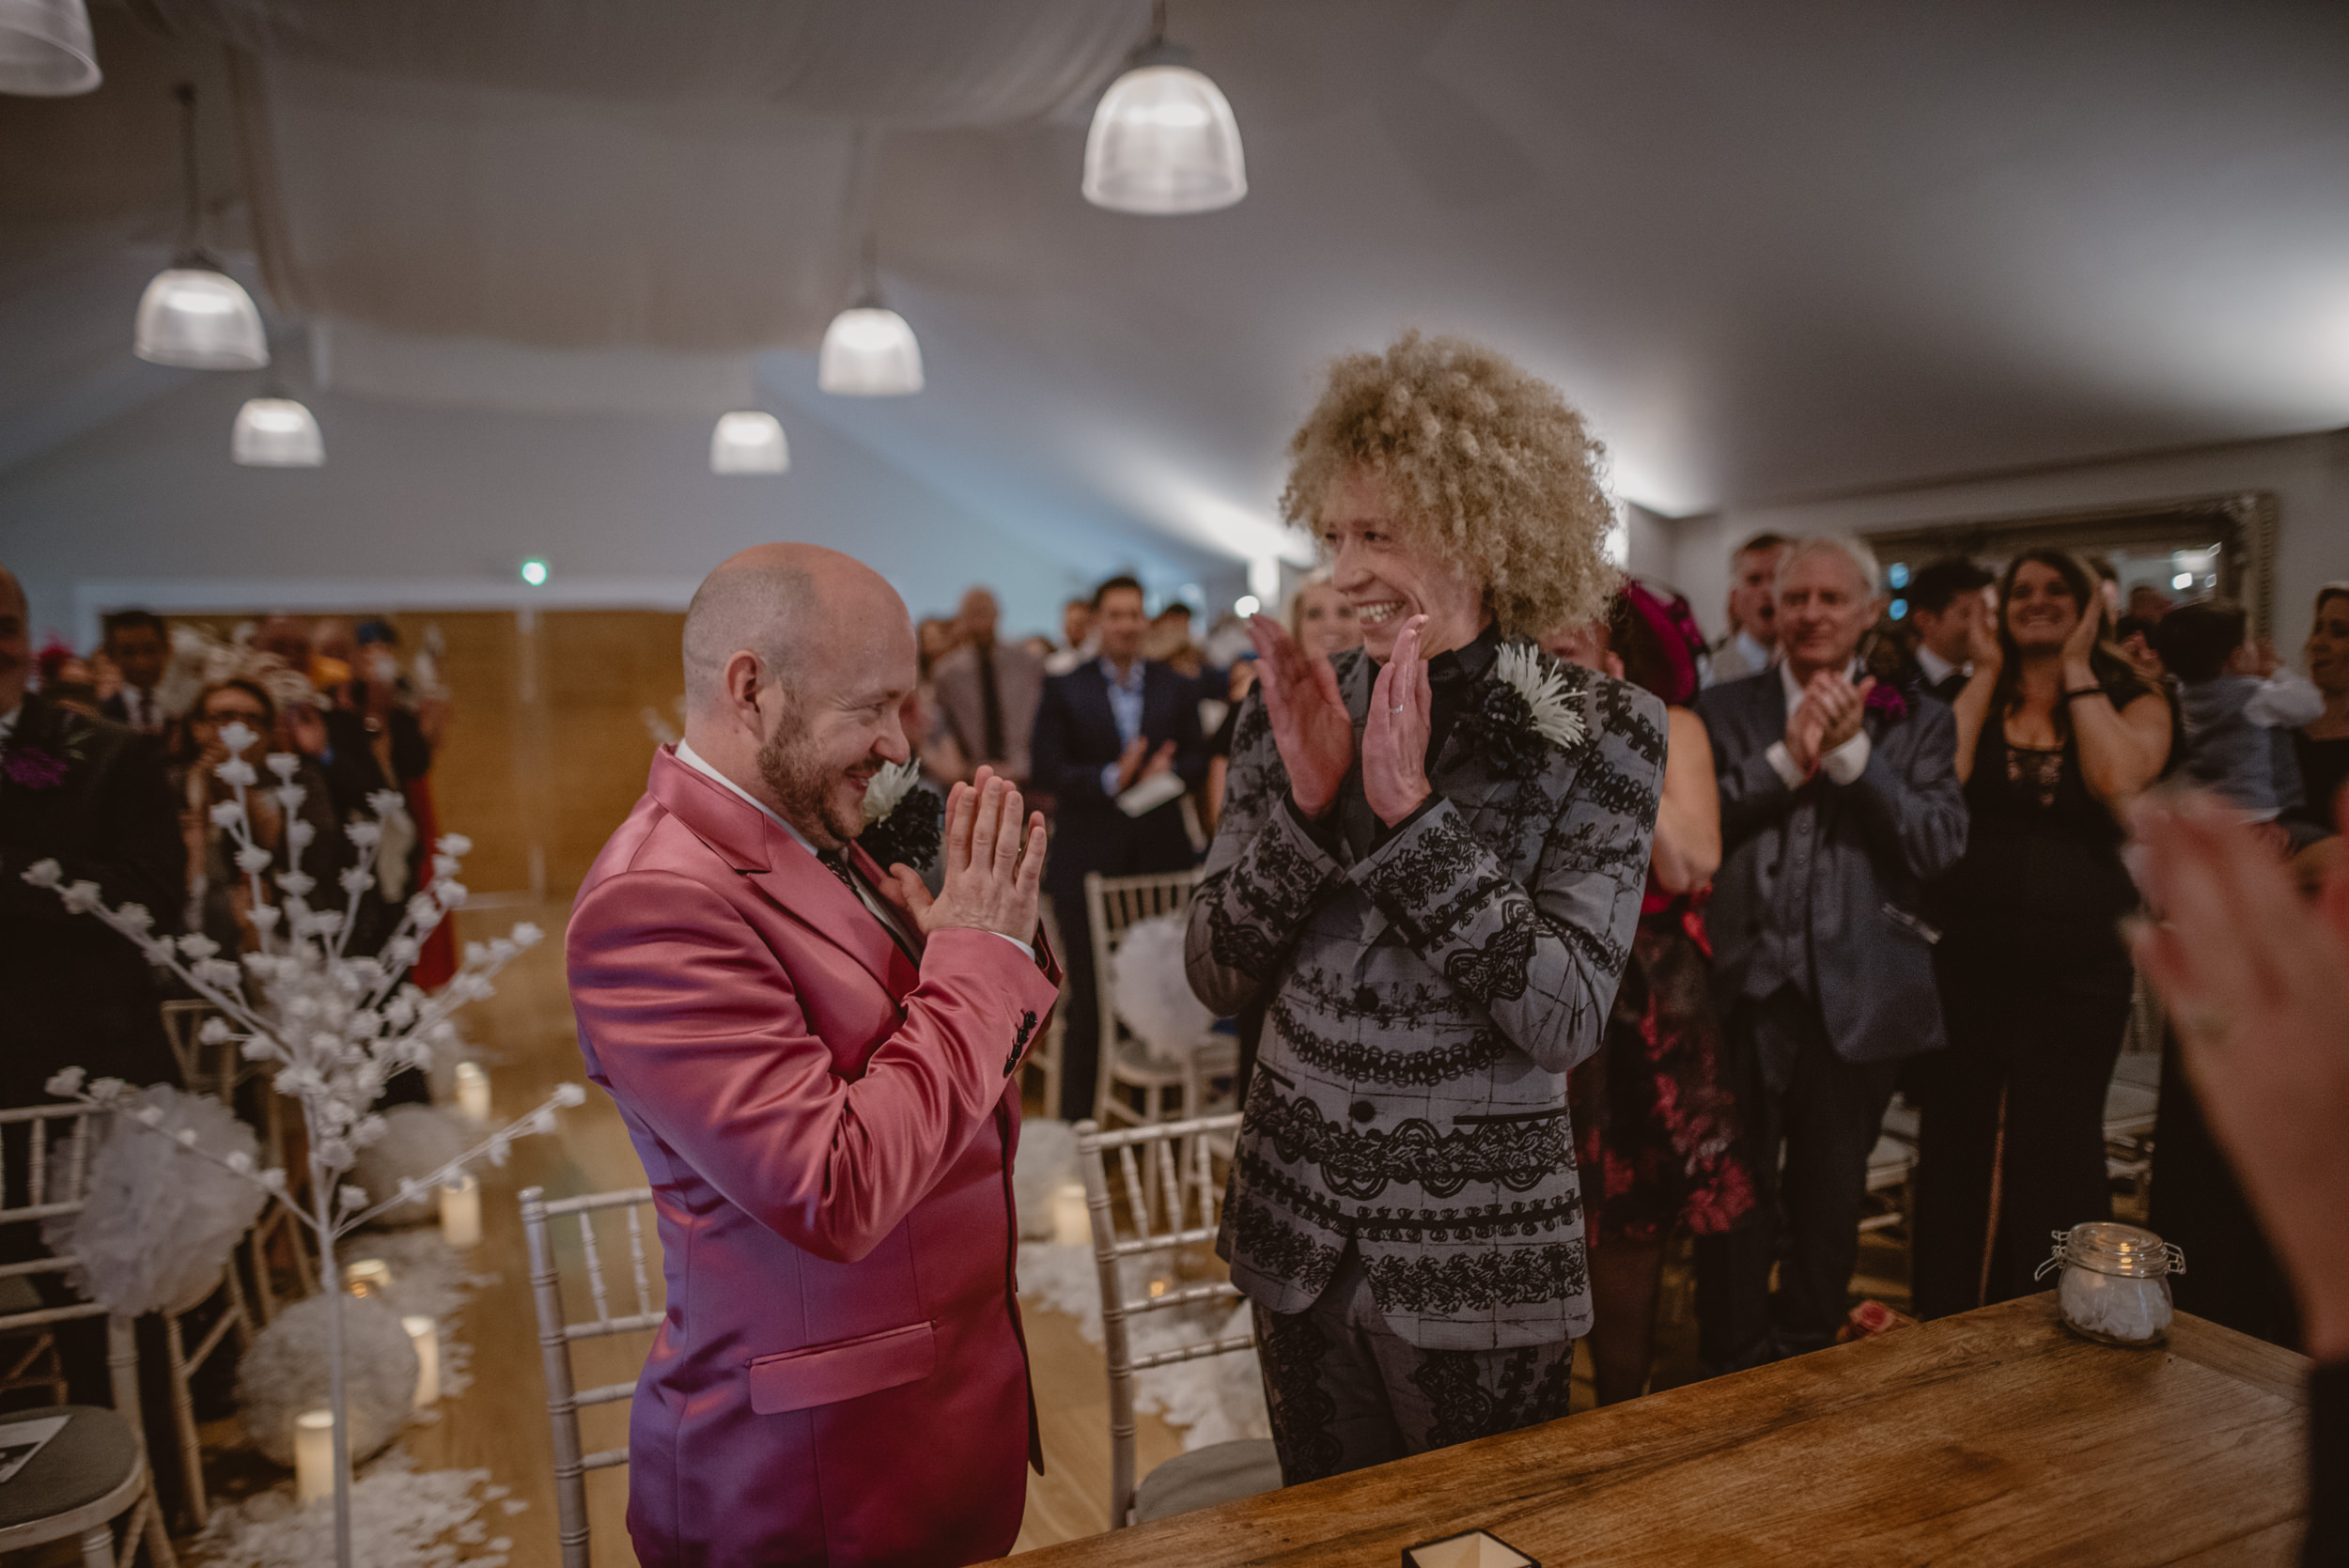 Barry-and-Chaz-wedding-Wasing-Park-Berkshire-Manu-Mendoza-Wedding-Photography-196.jpg